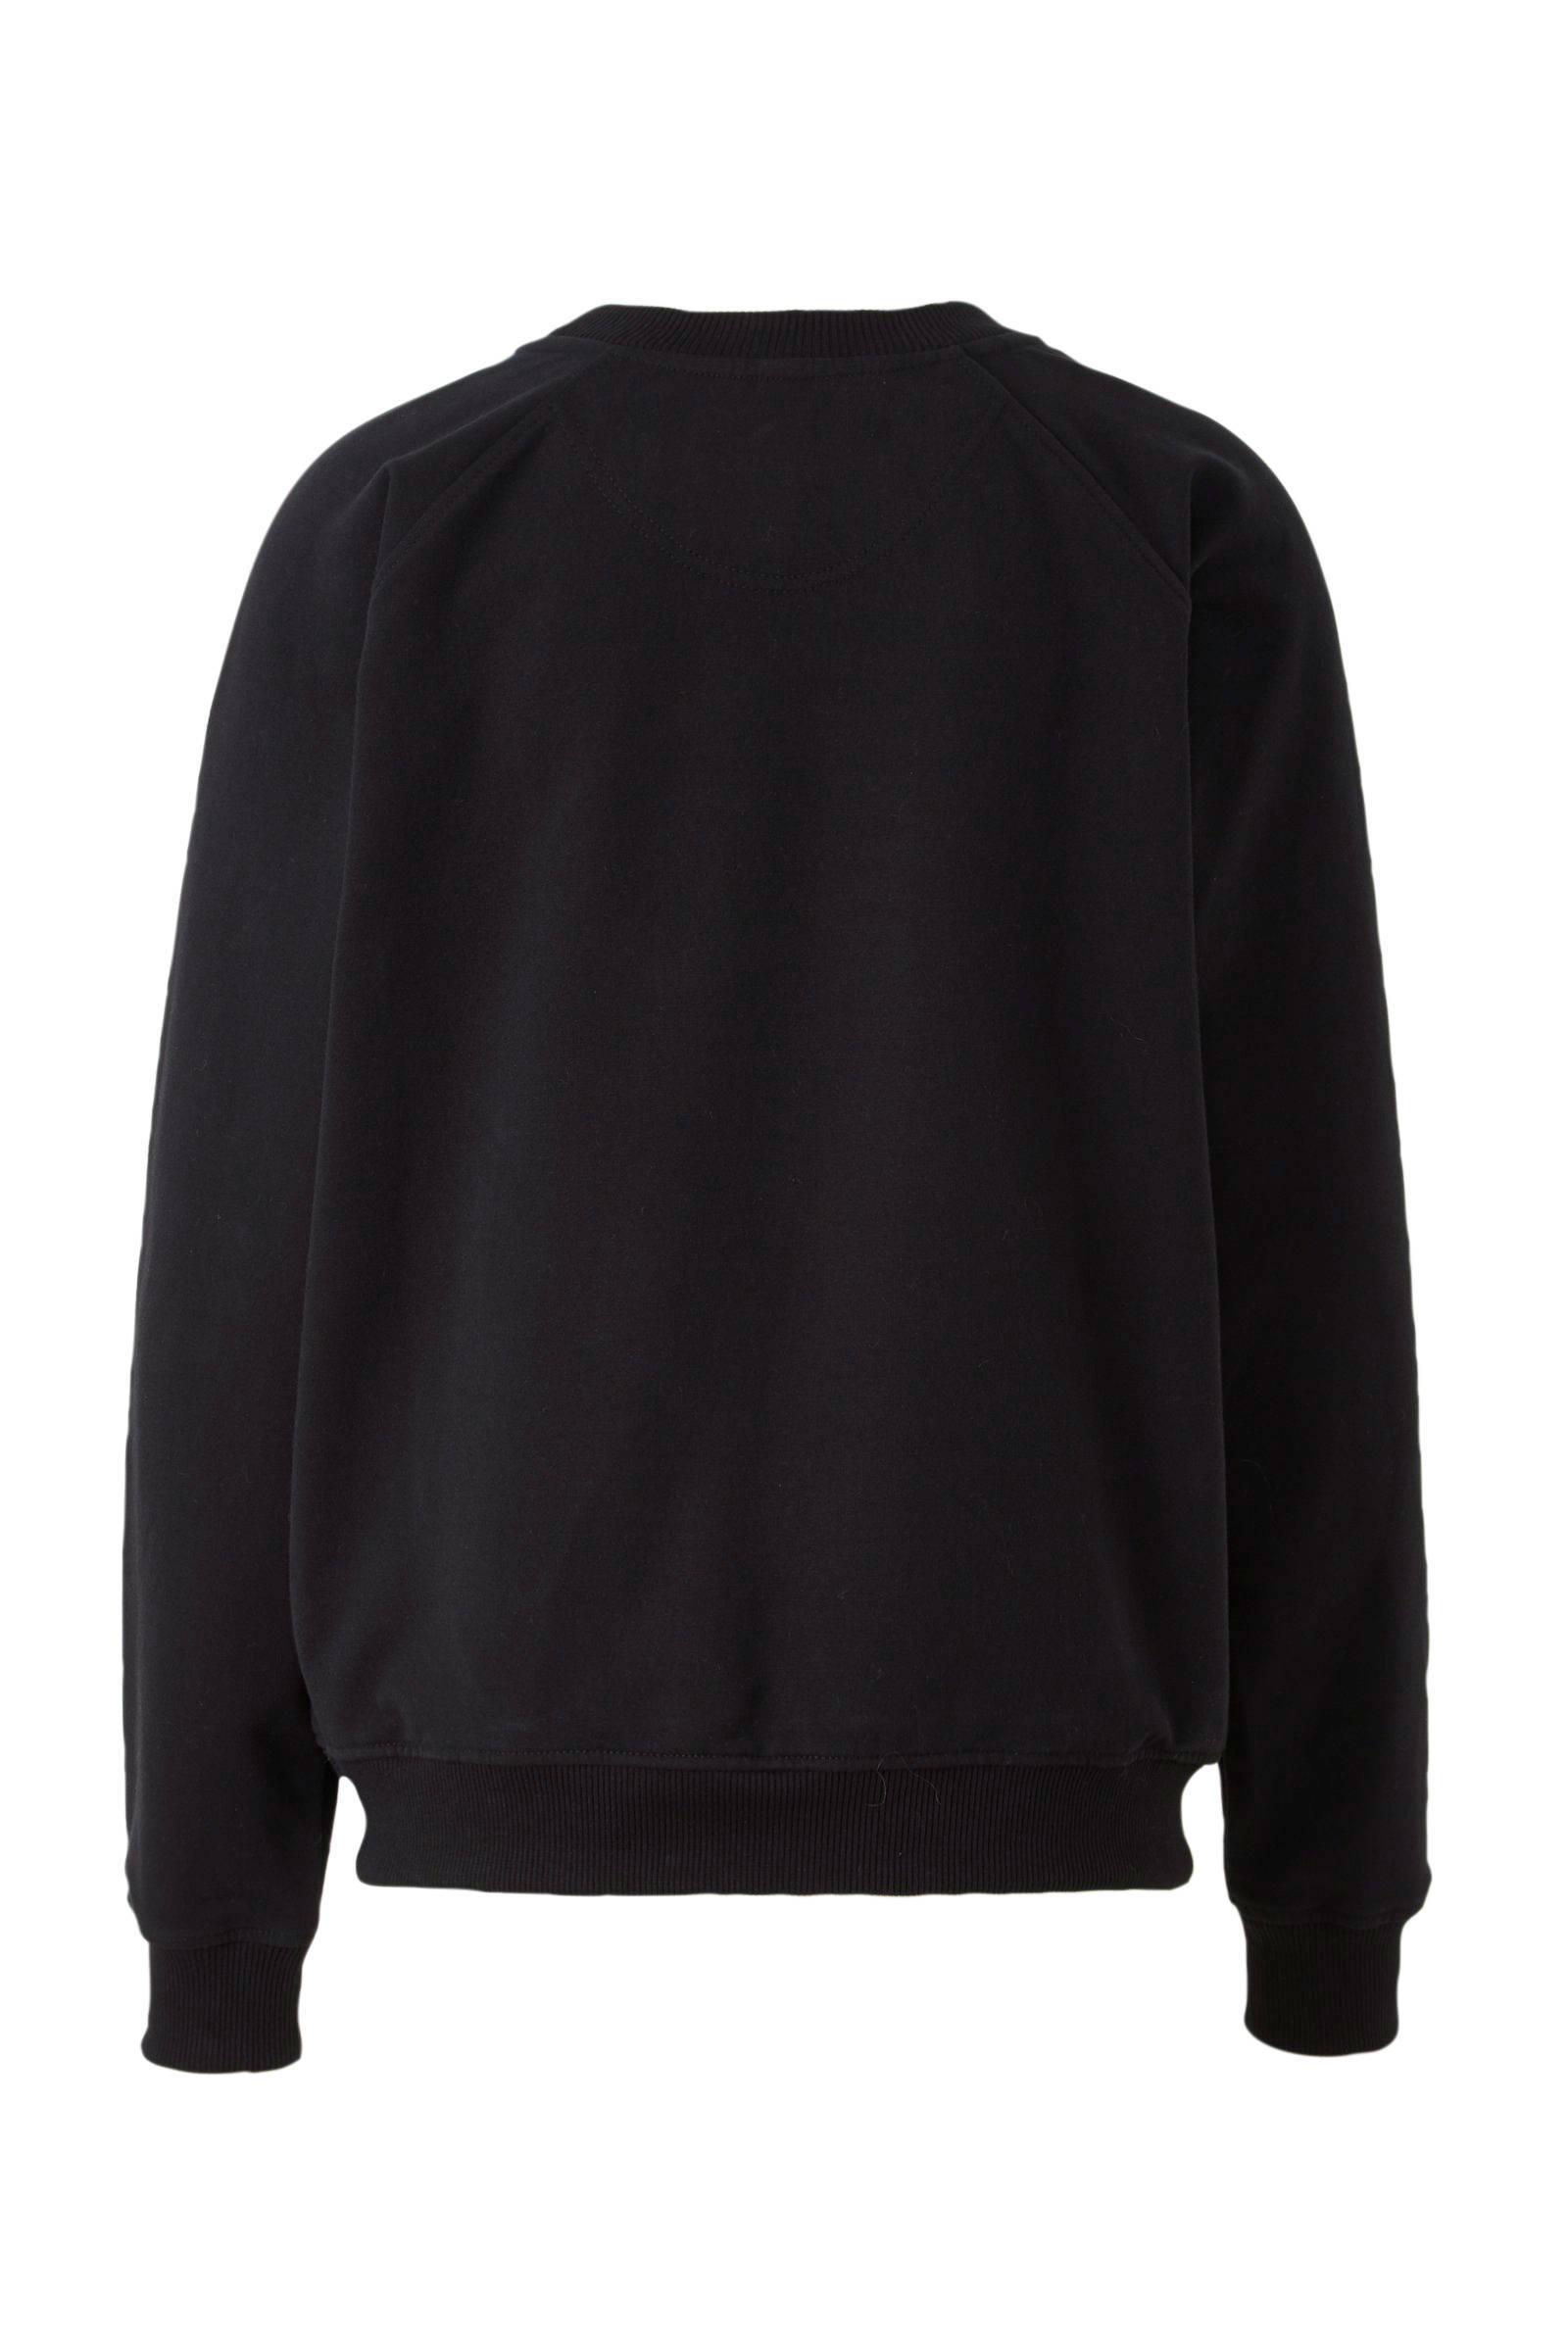 10DAYS sweater met printopdruk zwart